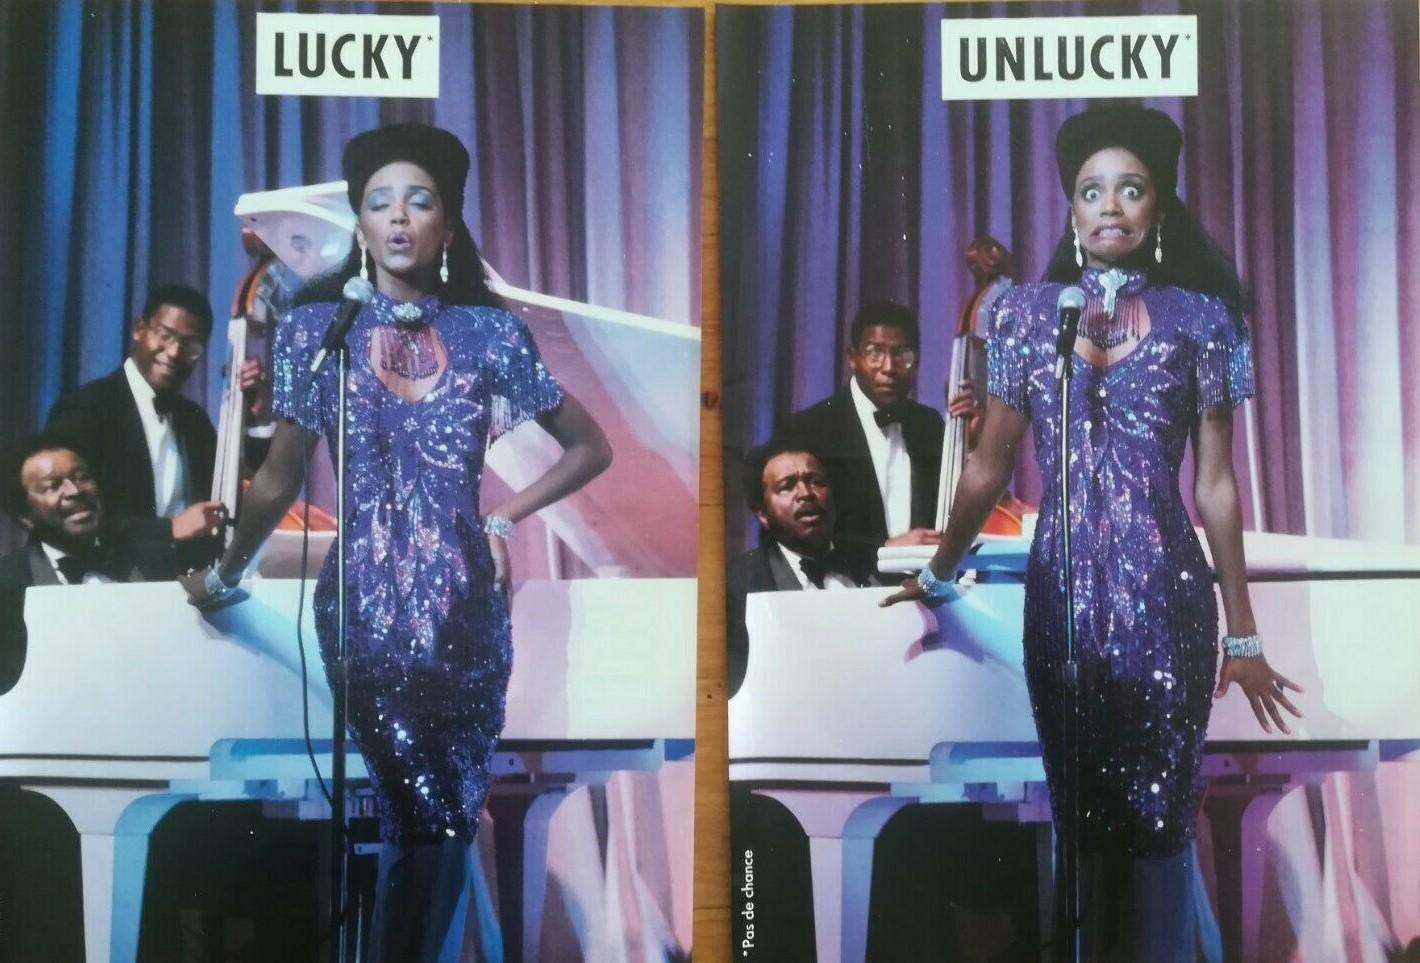 1992 luckyA